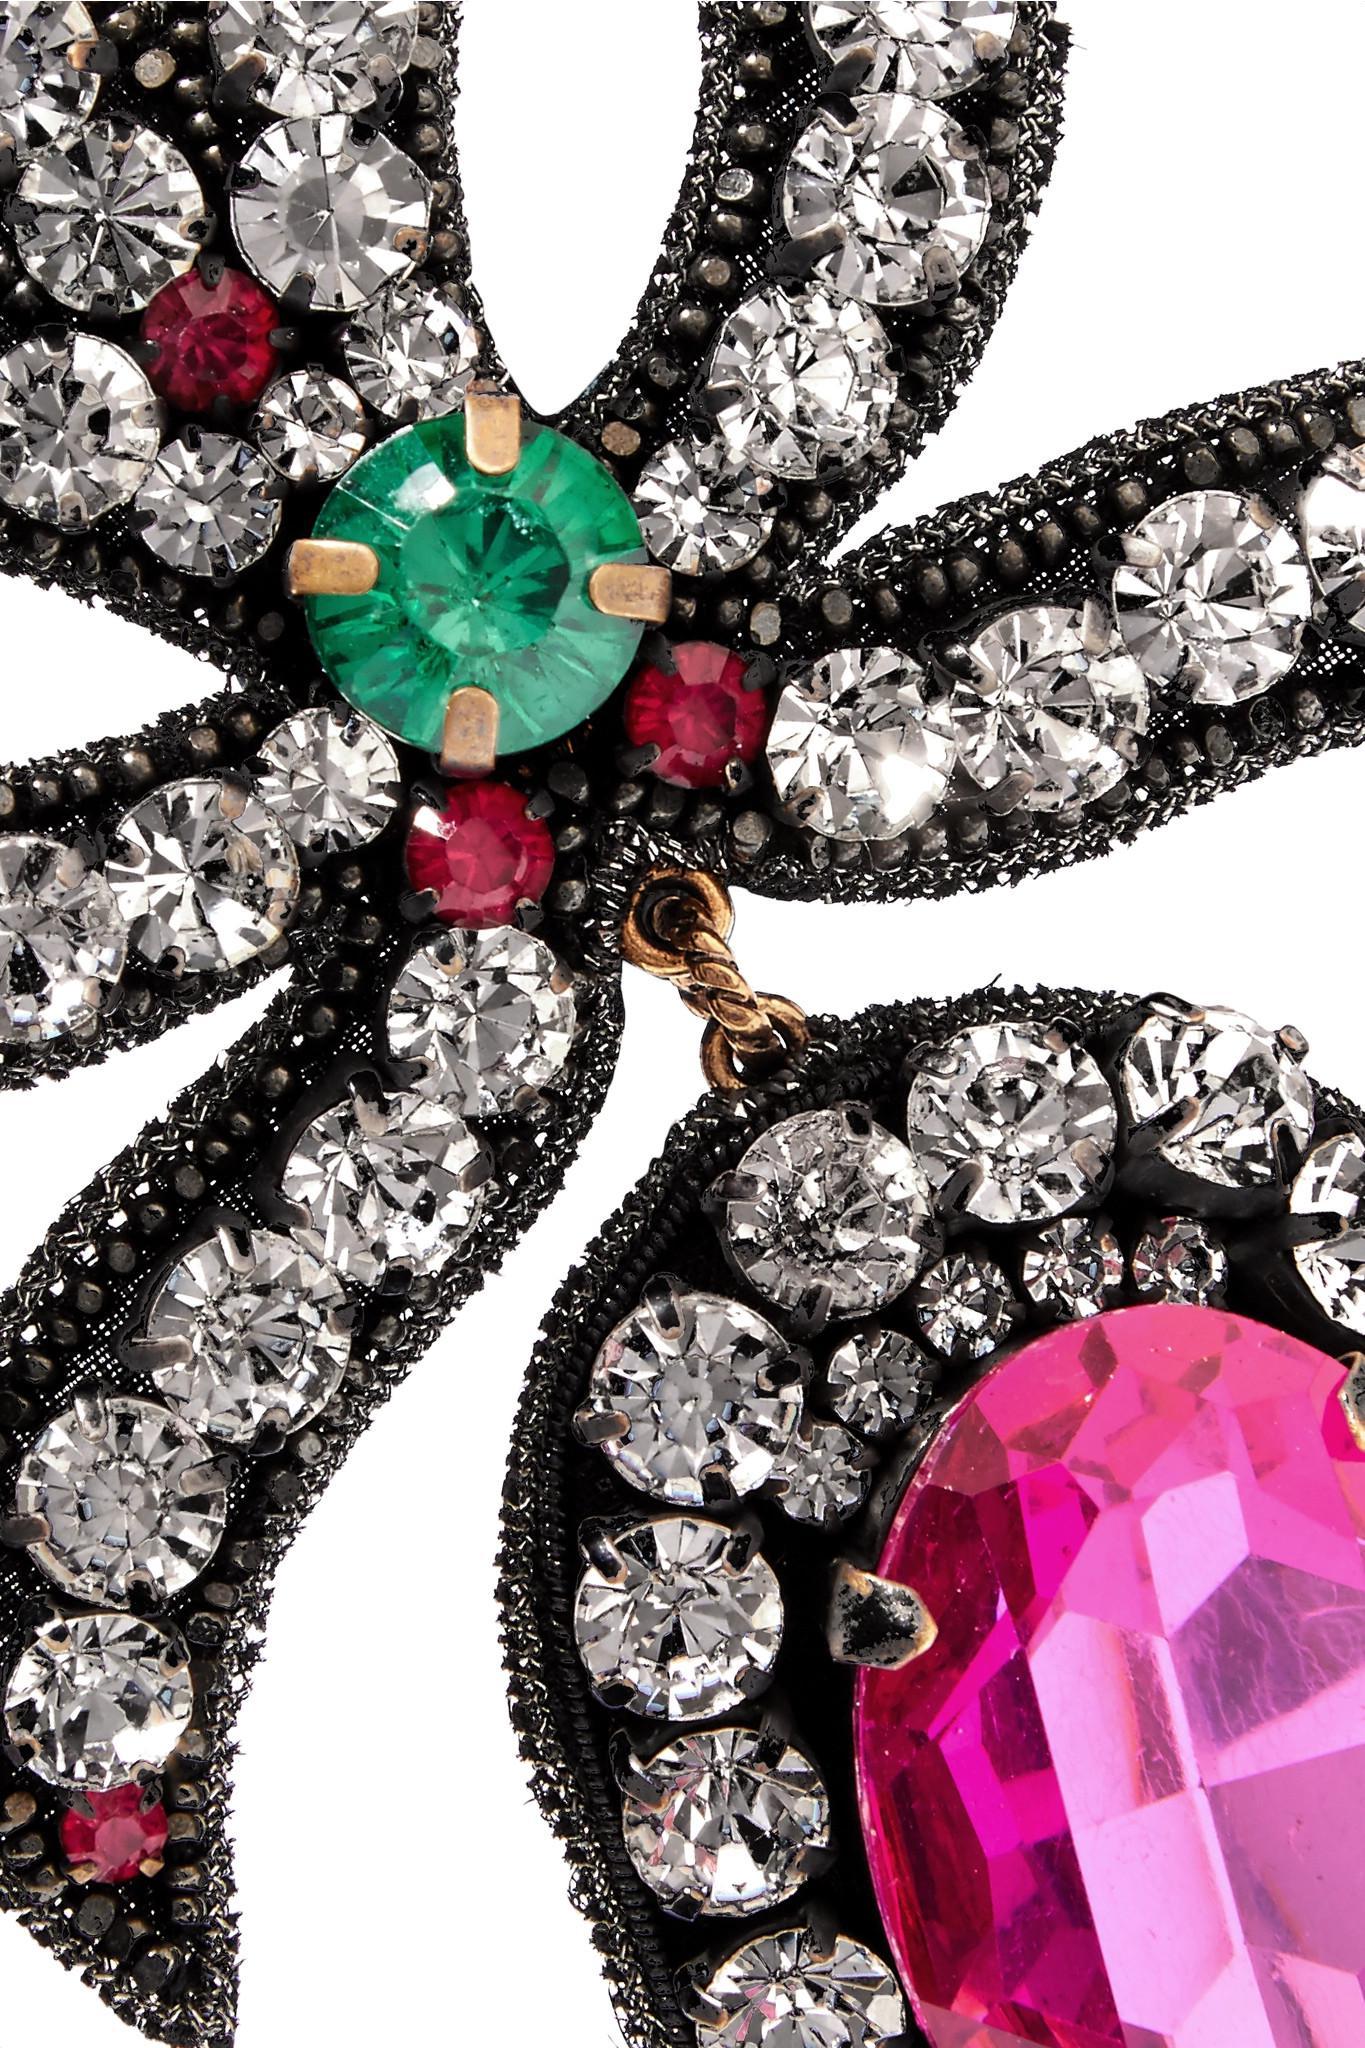 Felt, Crystal And Bead Earrings - Black Gucci